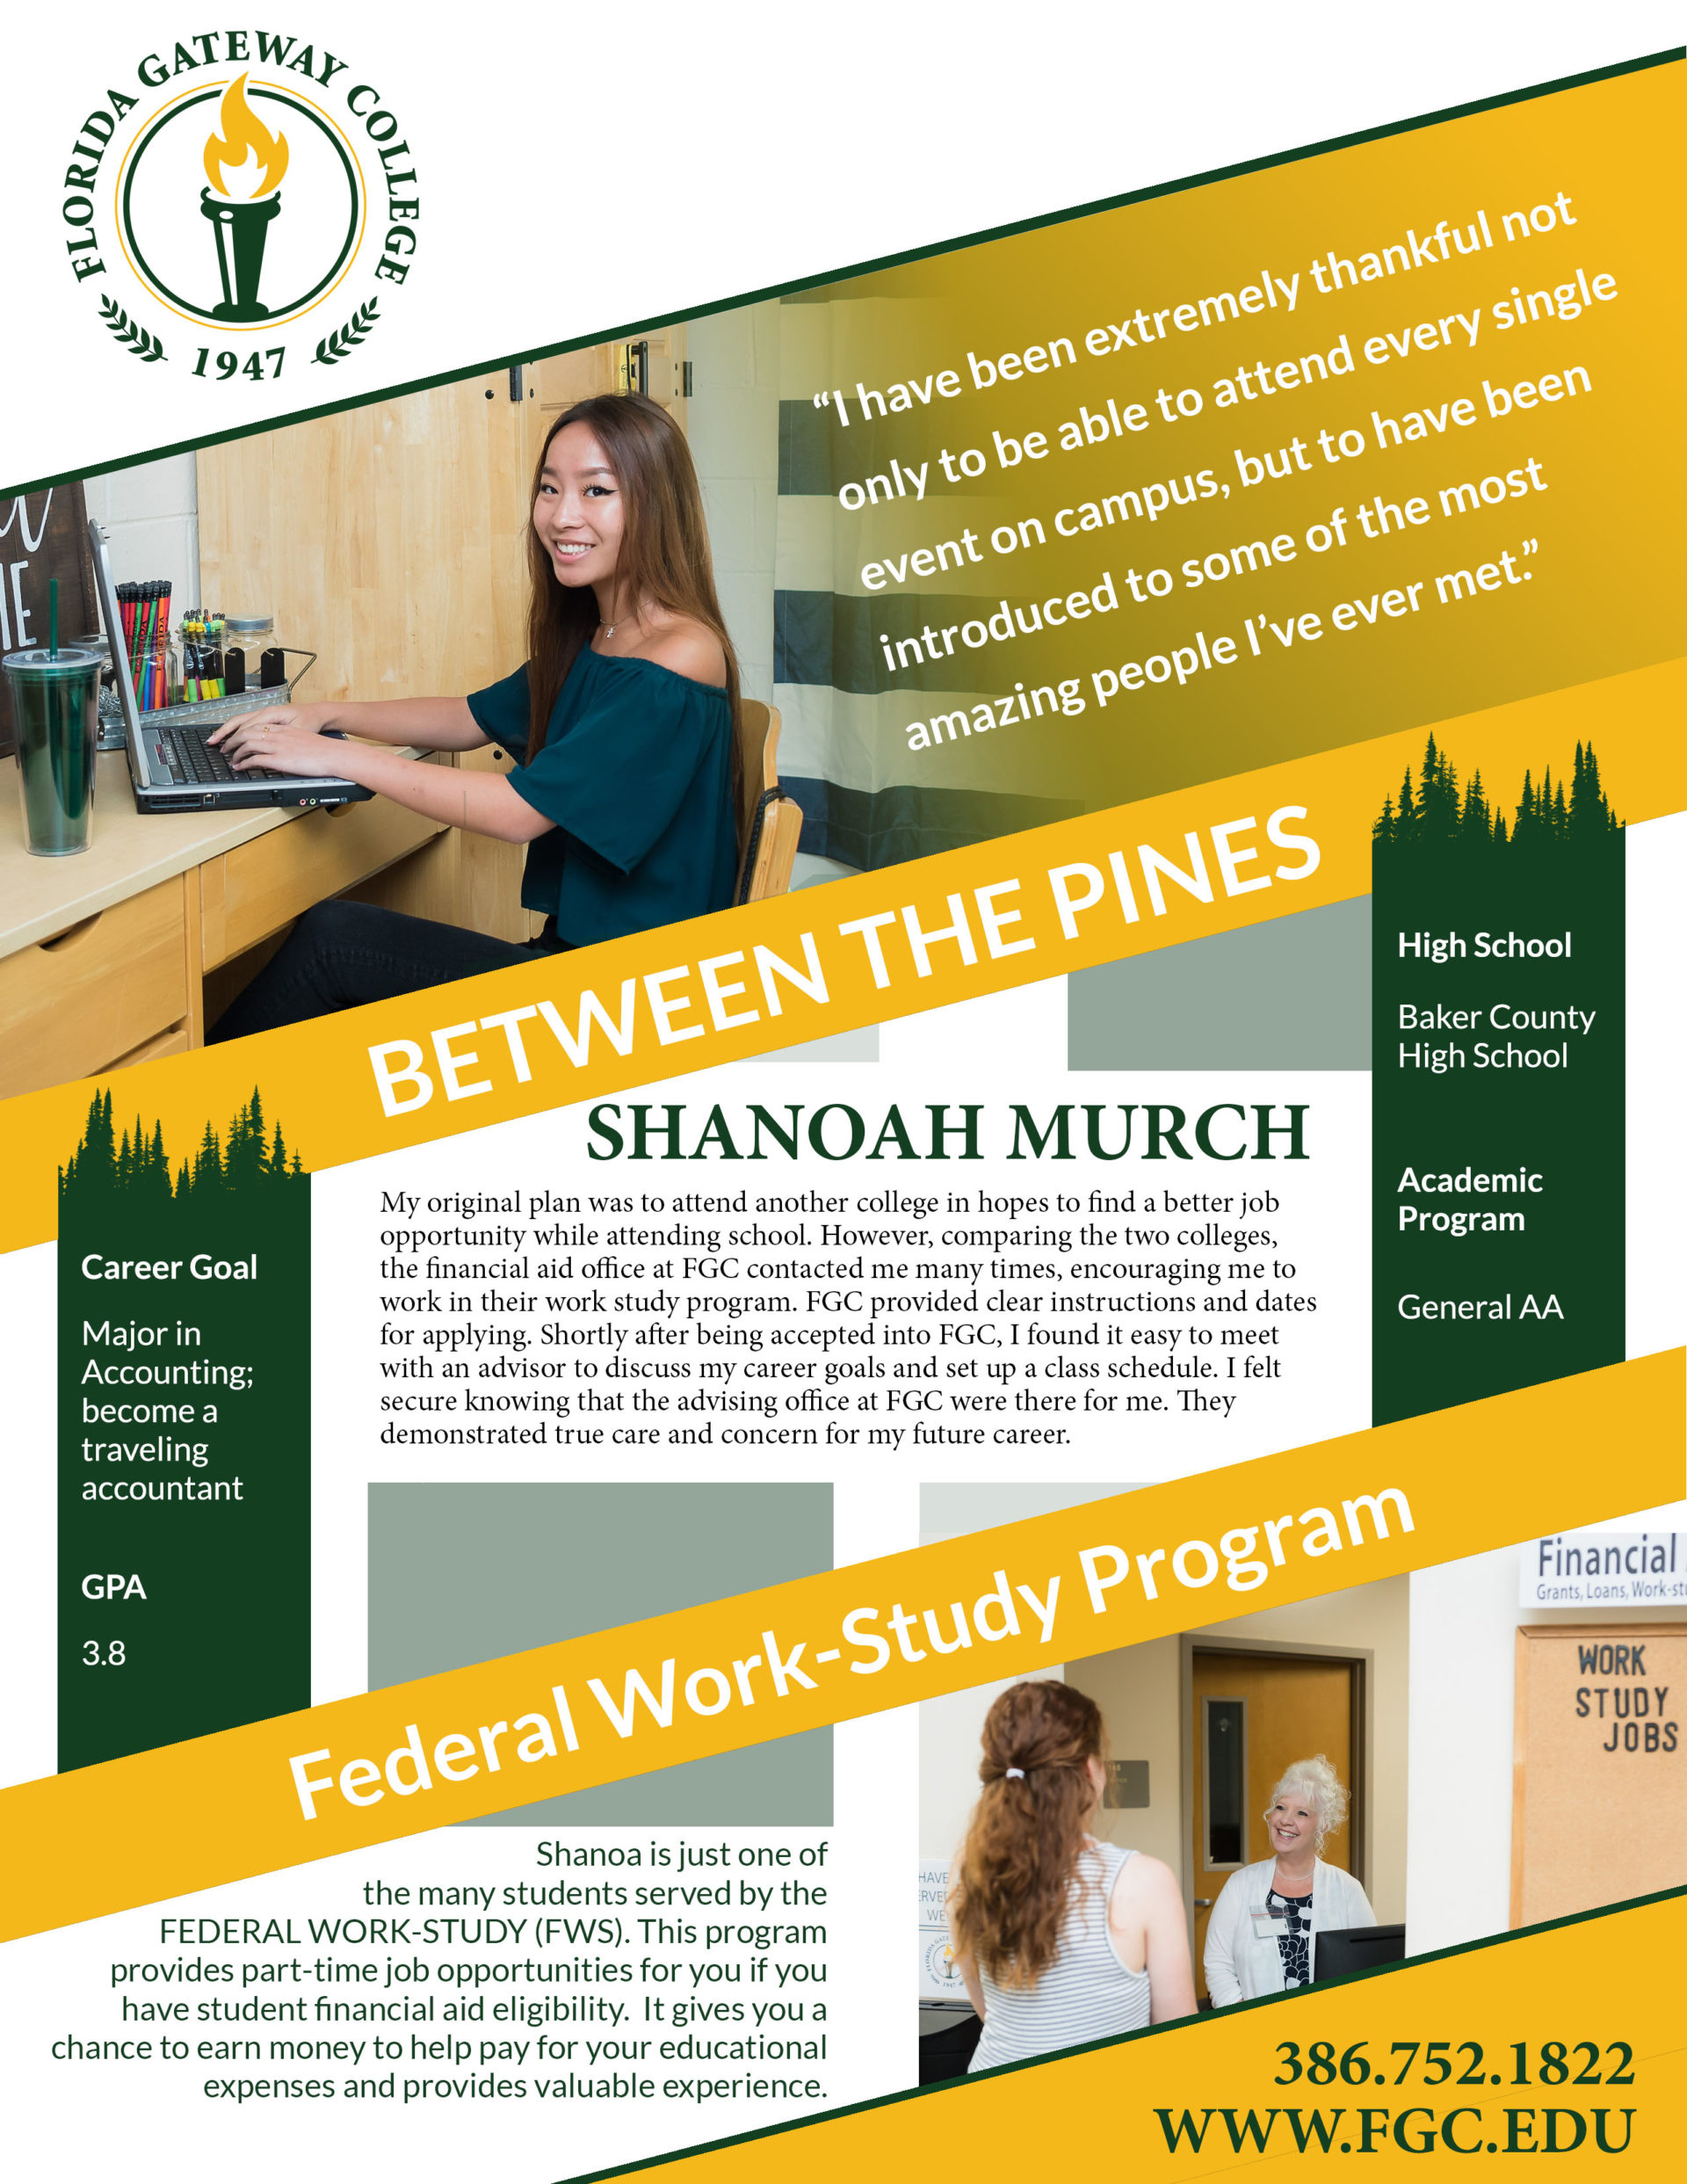 Shanoah Murch's Story